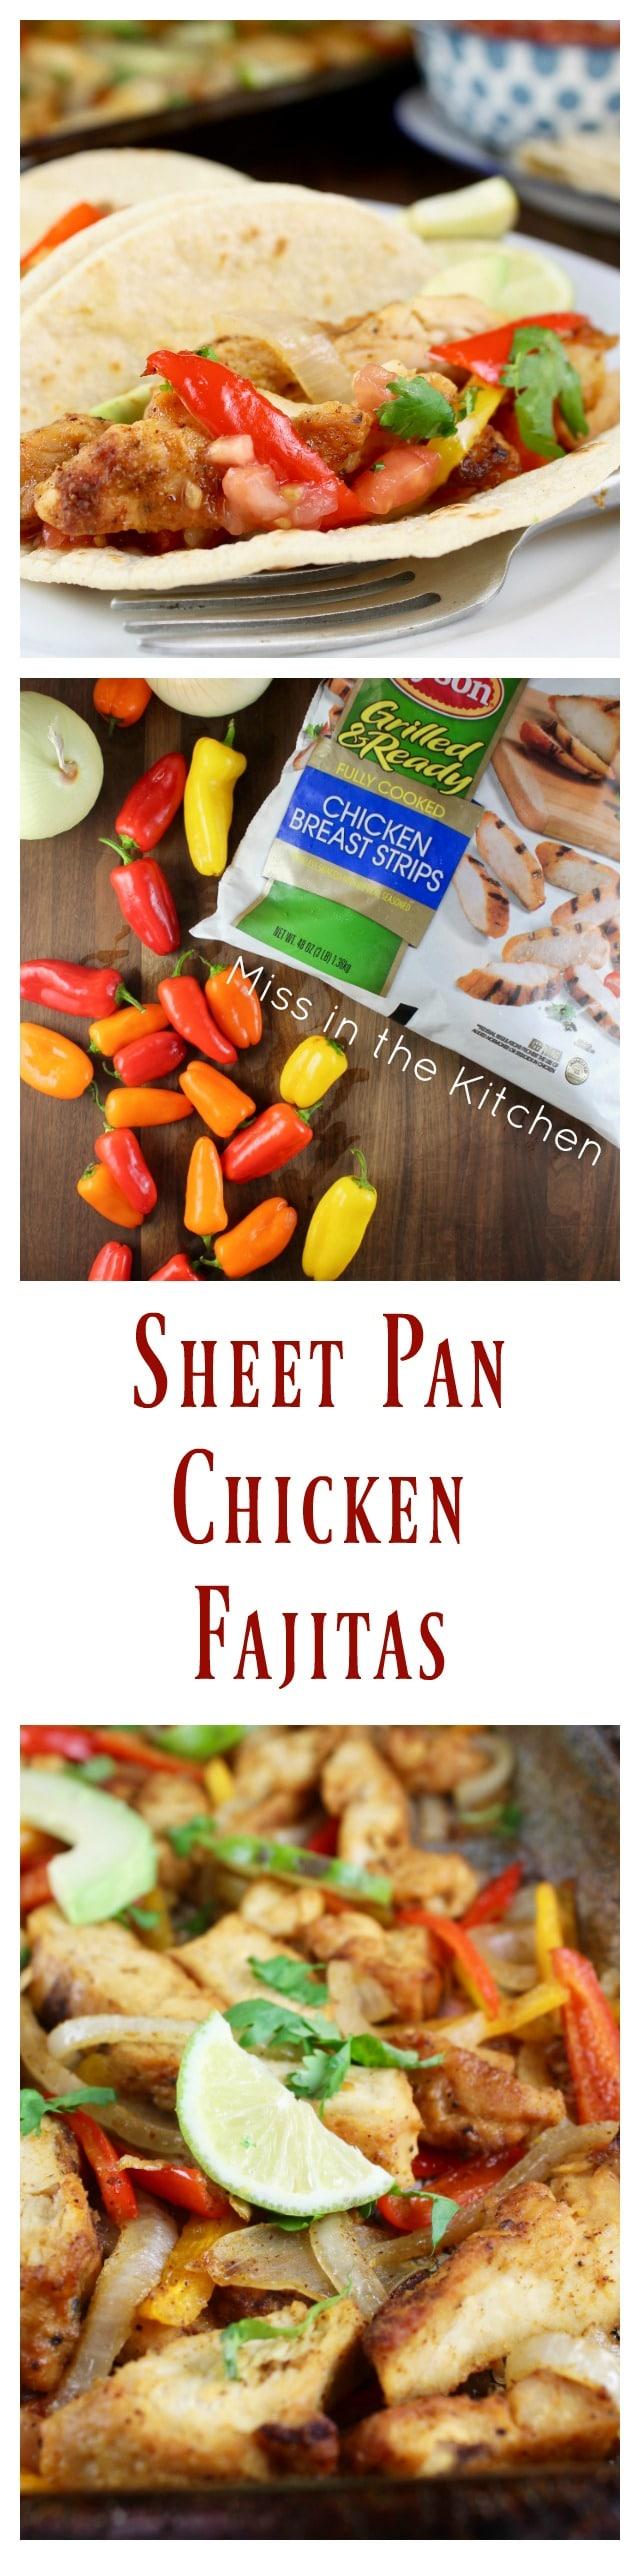 Easy Sheet Pan Chicken Fajitas Recipe with Tyson #GrilledandReady Chicken Strips for an easy weeknight dinner! From MissintheKitchen.com #ad